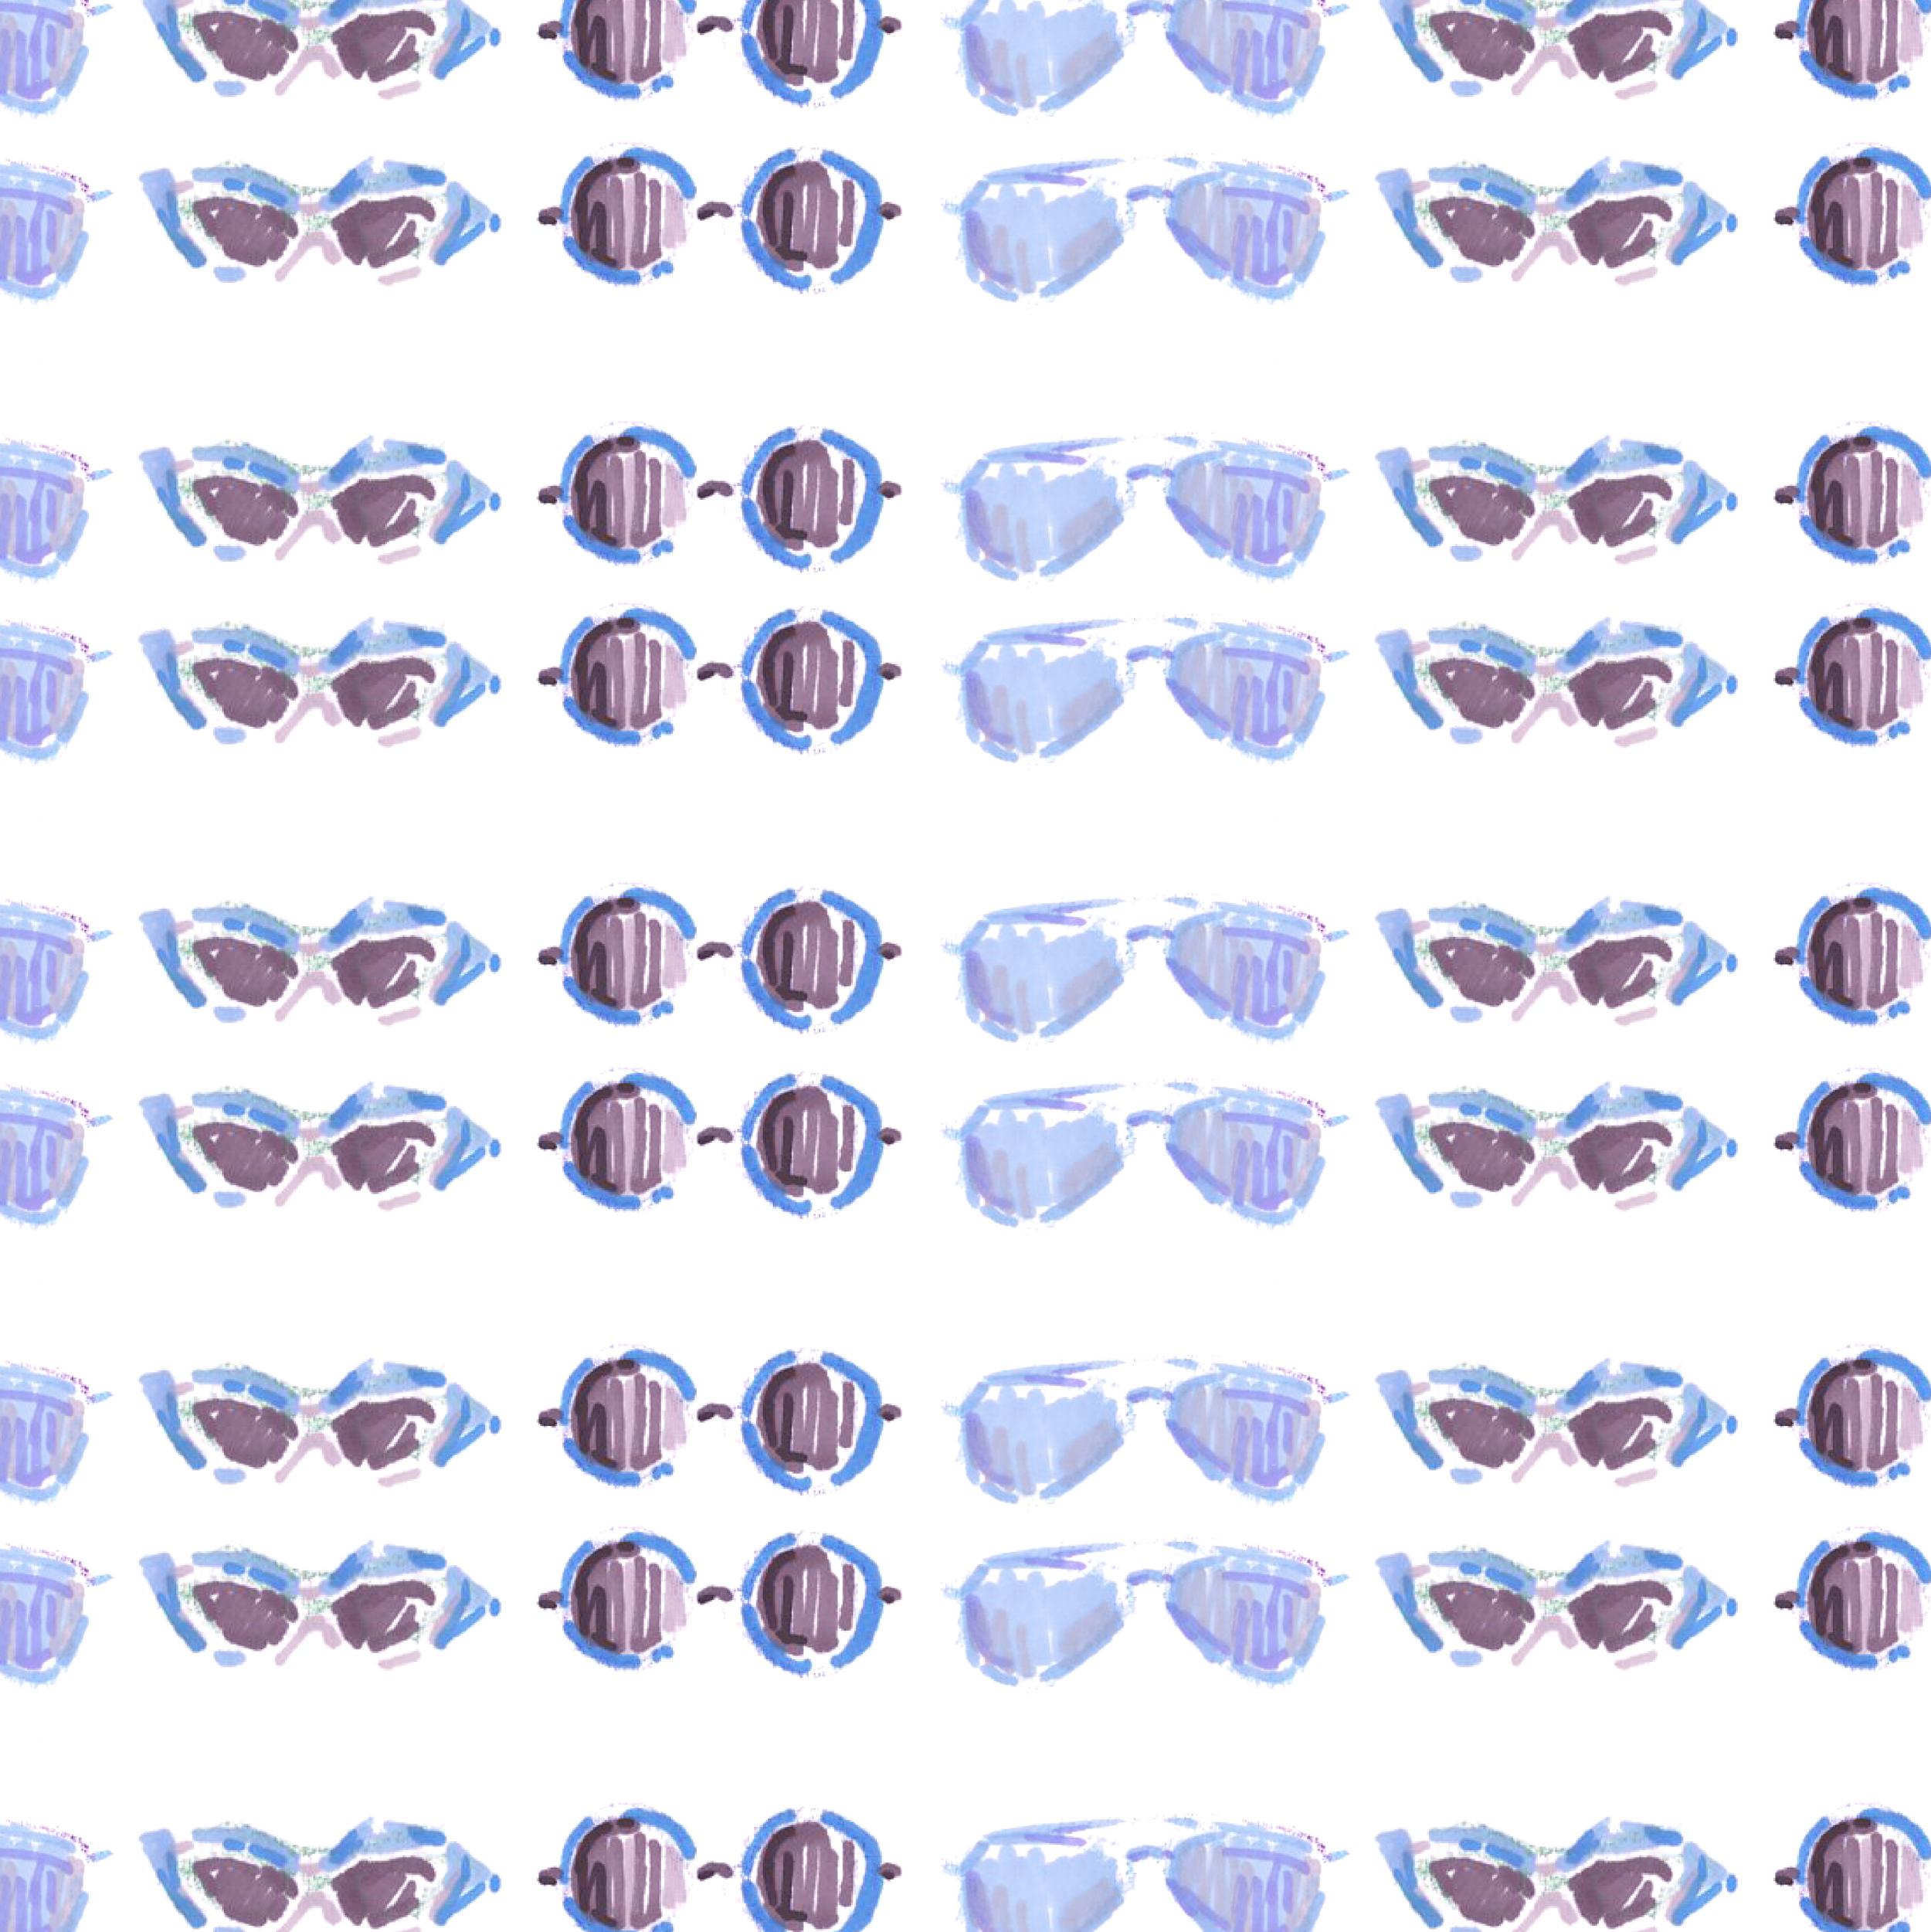 Pattern5. Sunglasses(Blue)